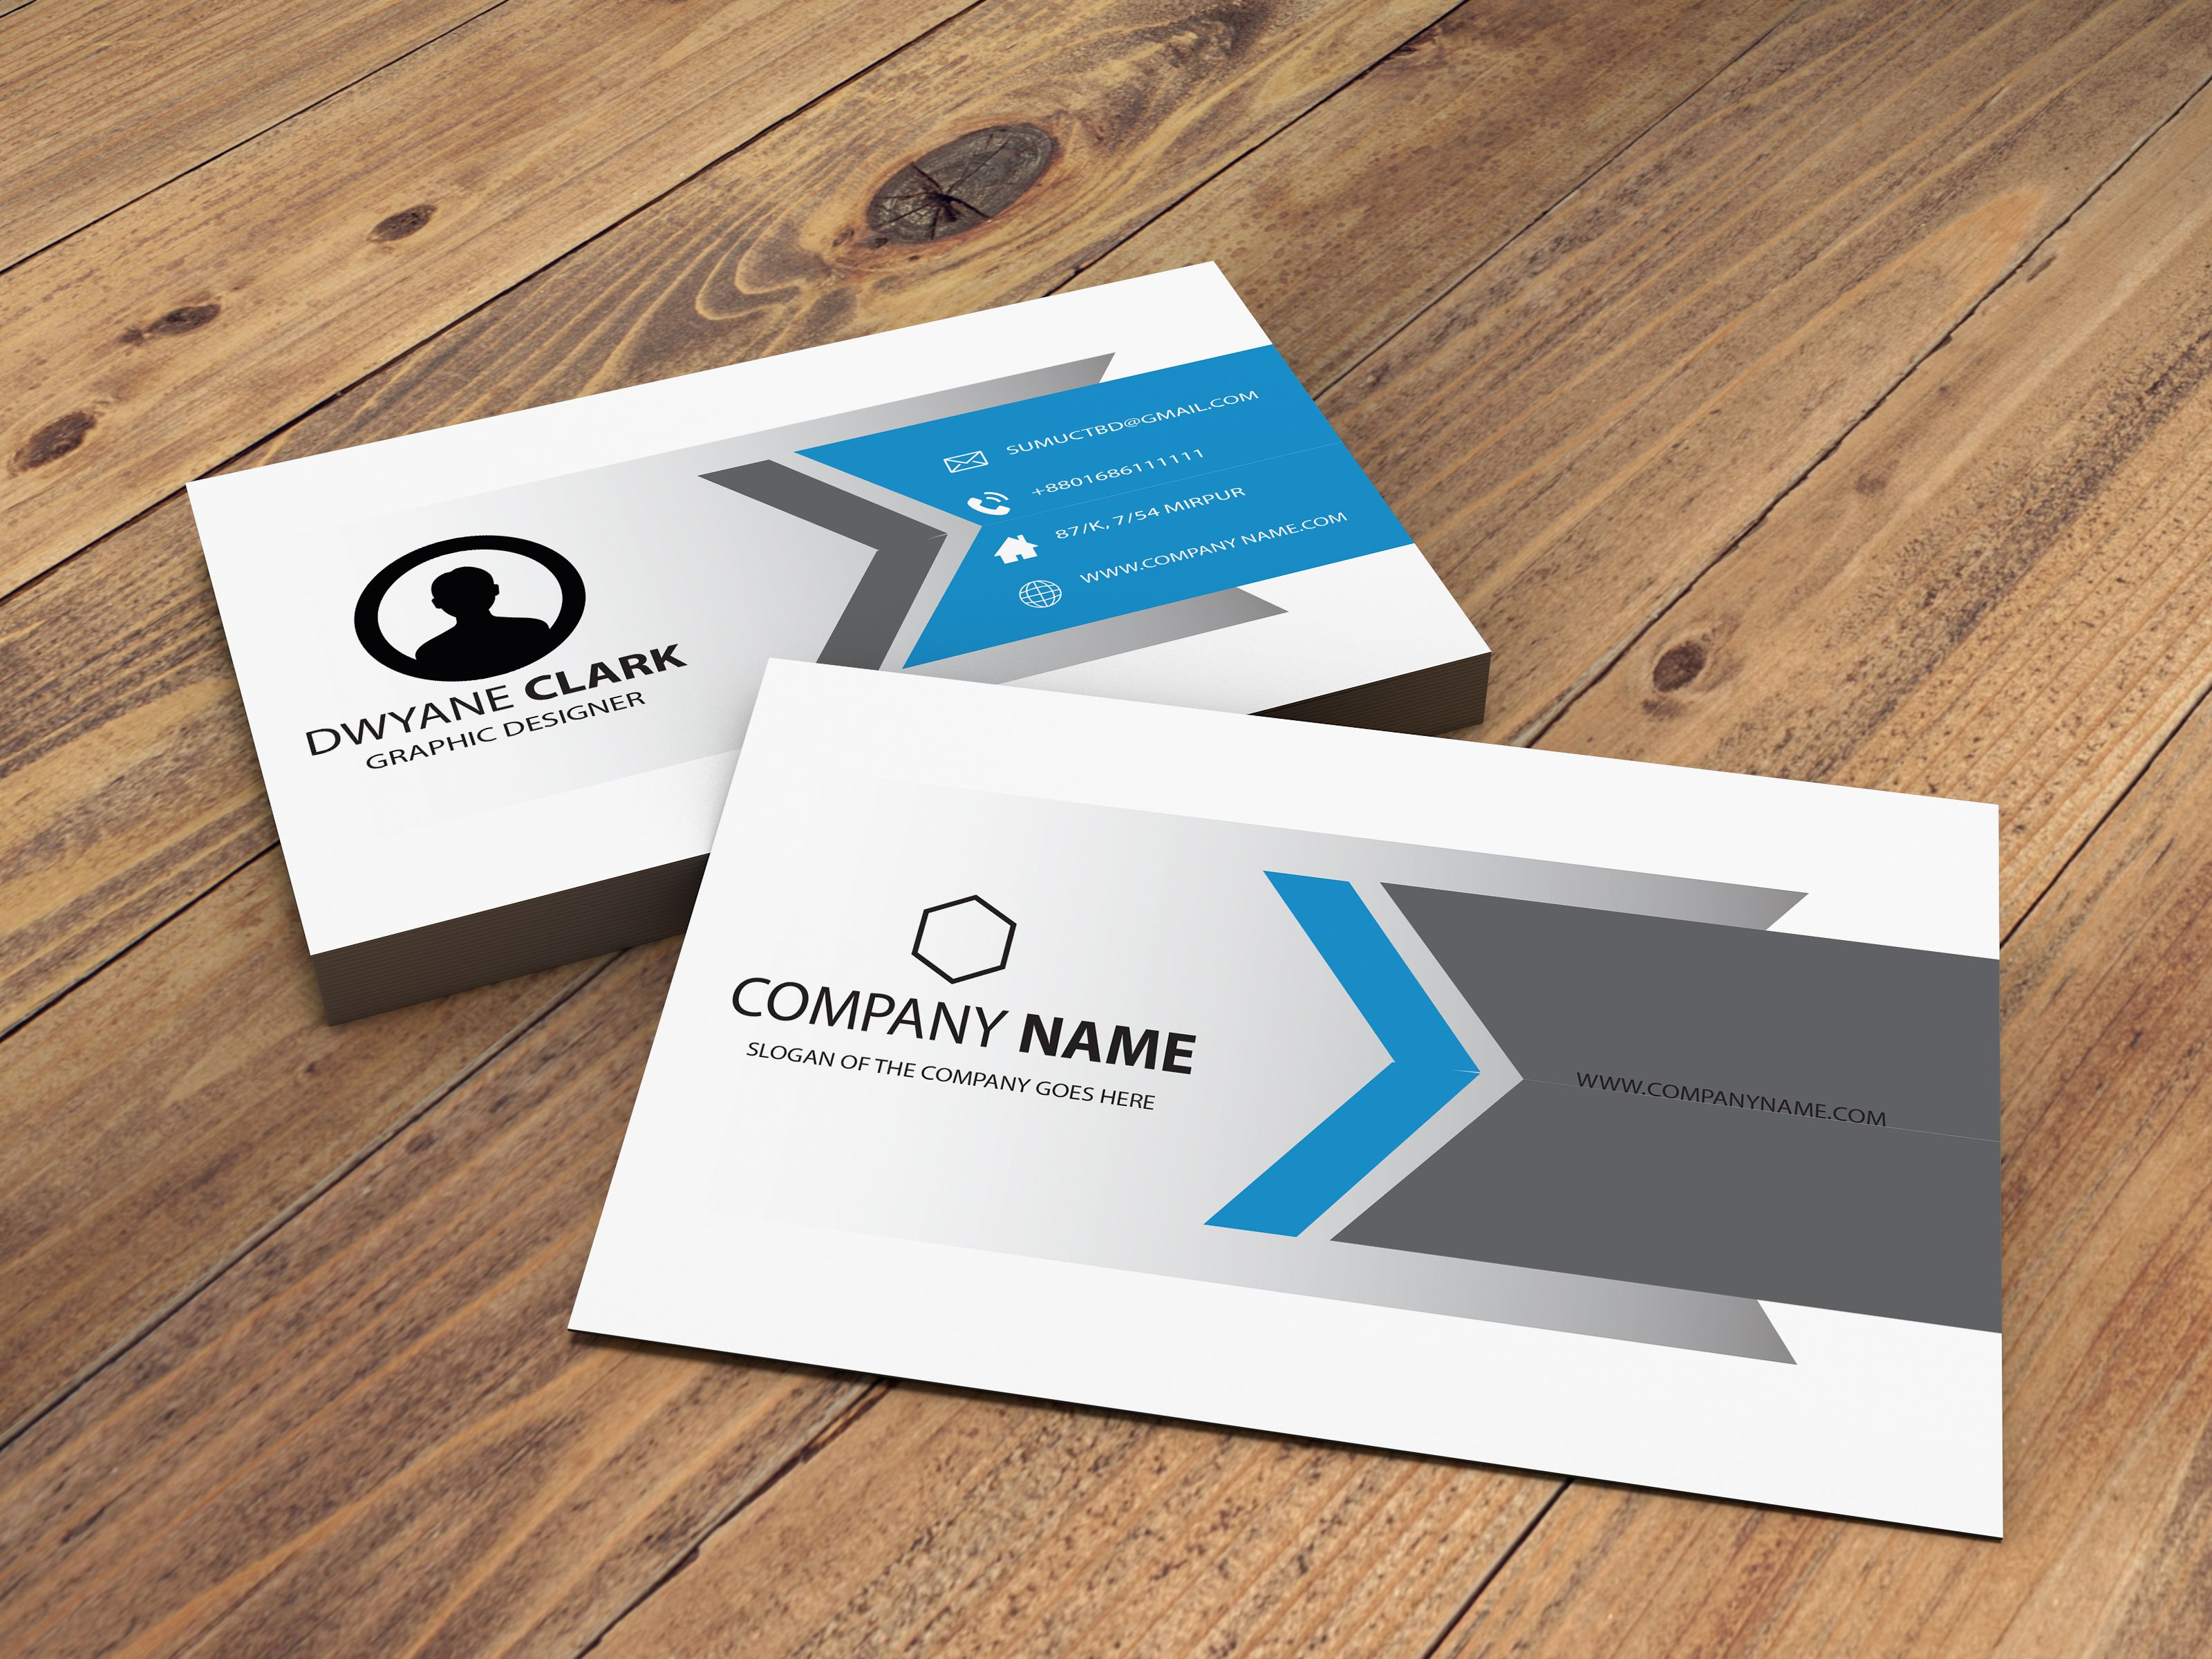 Sumu0007 I Will Create A Custom Business Card Letterhead And Stationary For 5 On Fiverr Com Custom Business Cards Business Card Design Professional Business Card Design